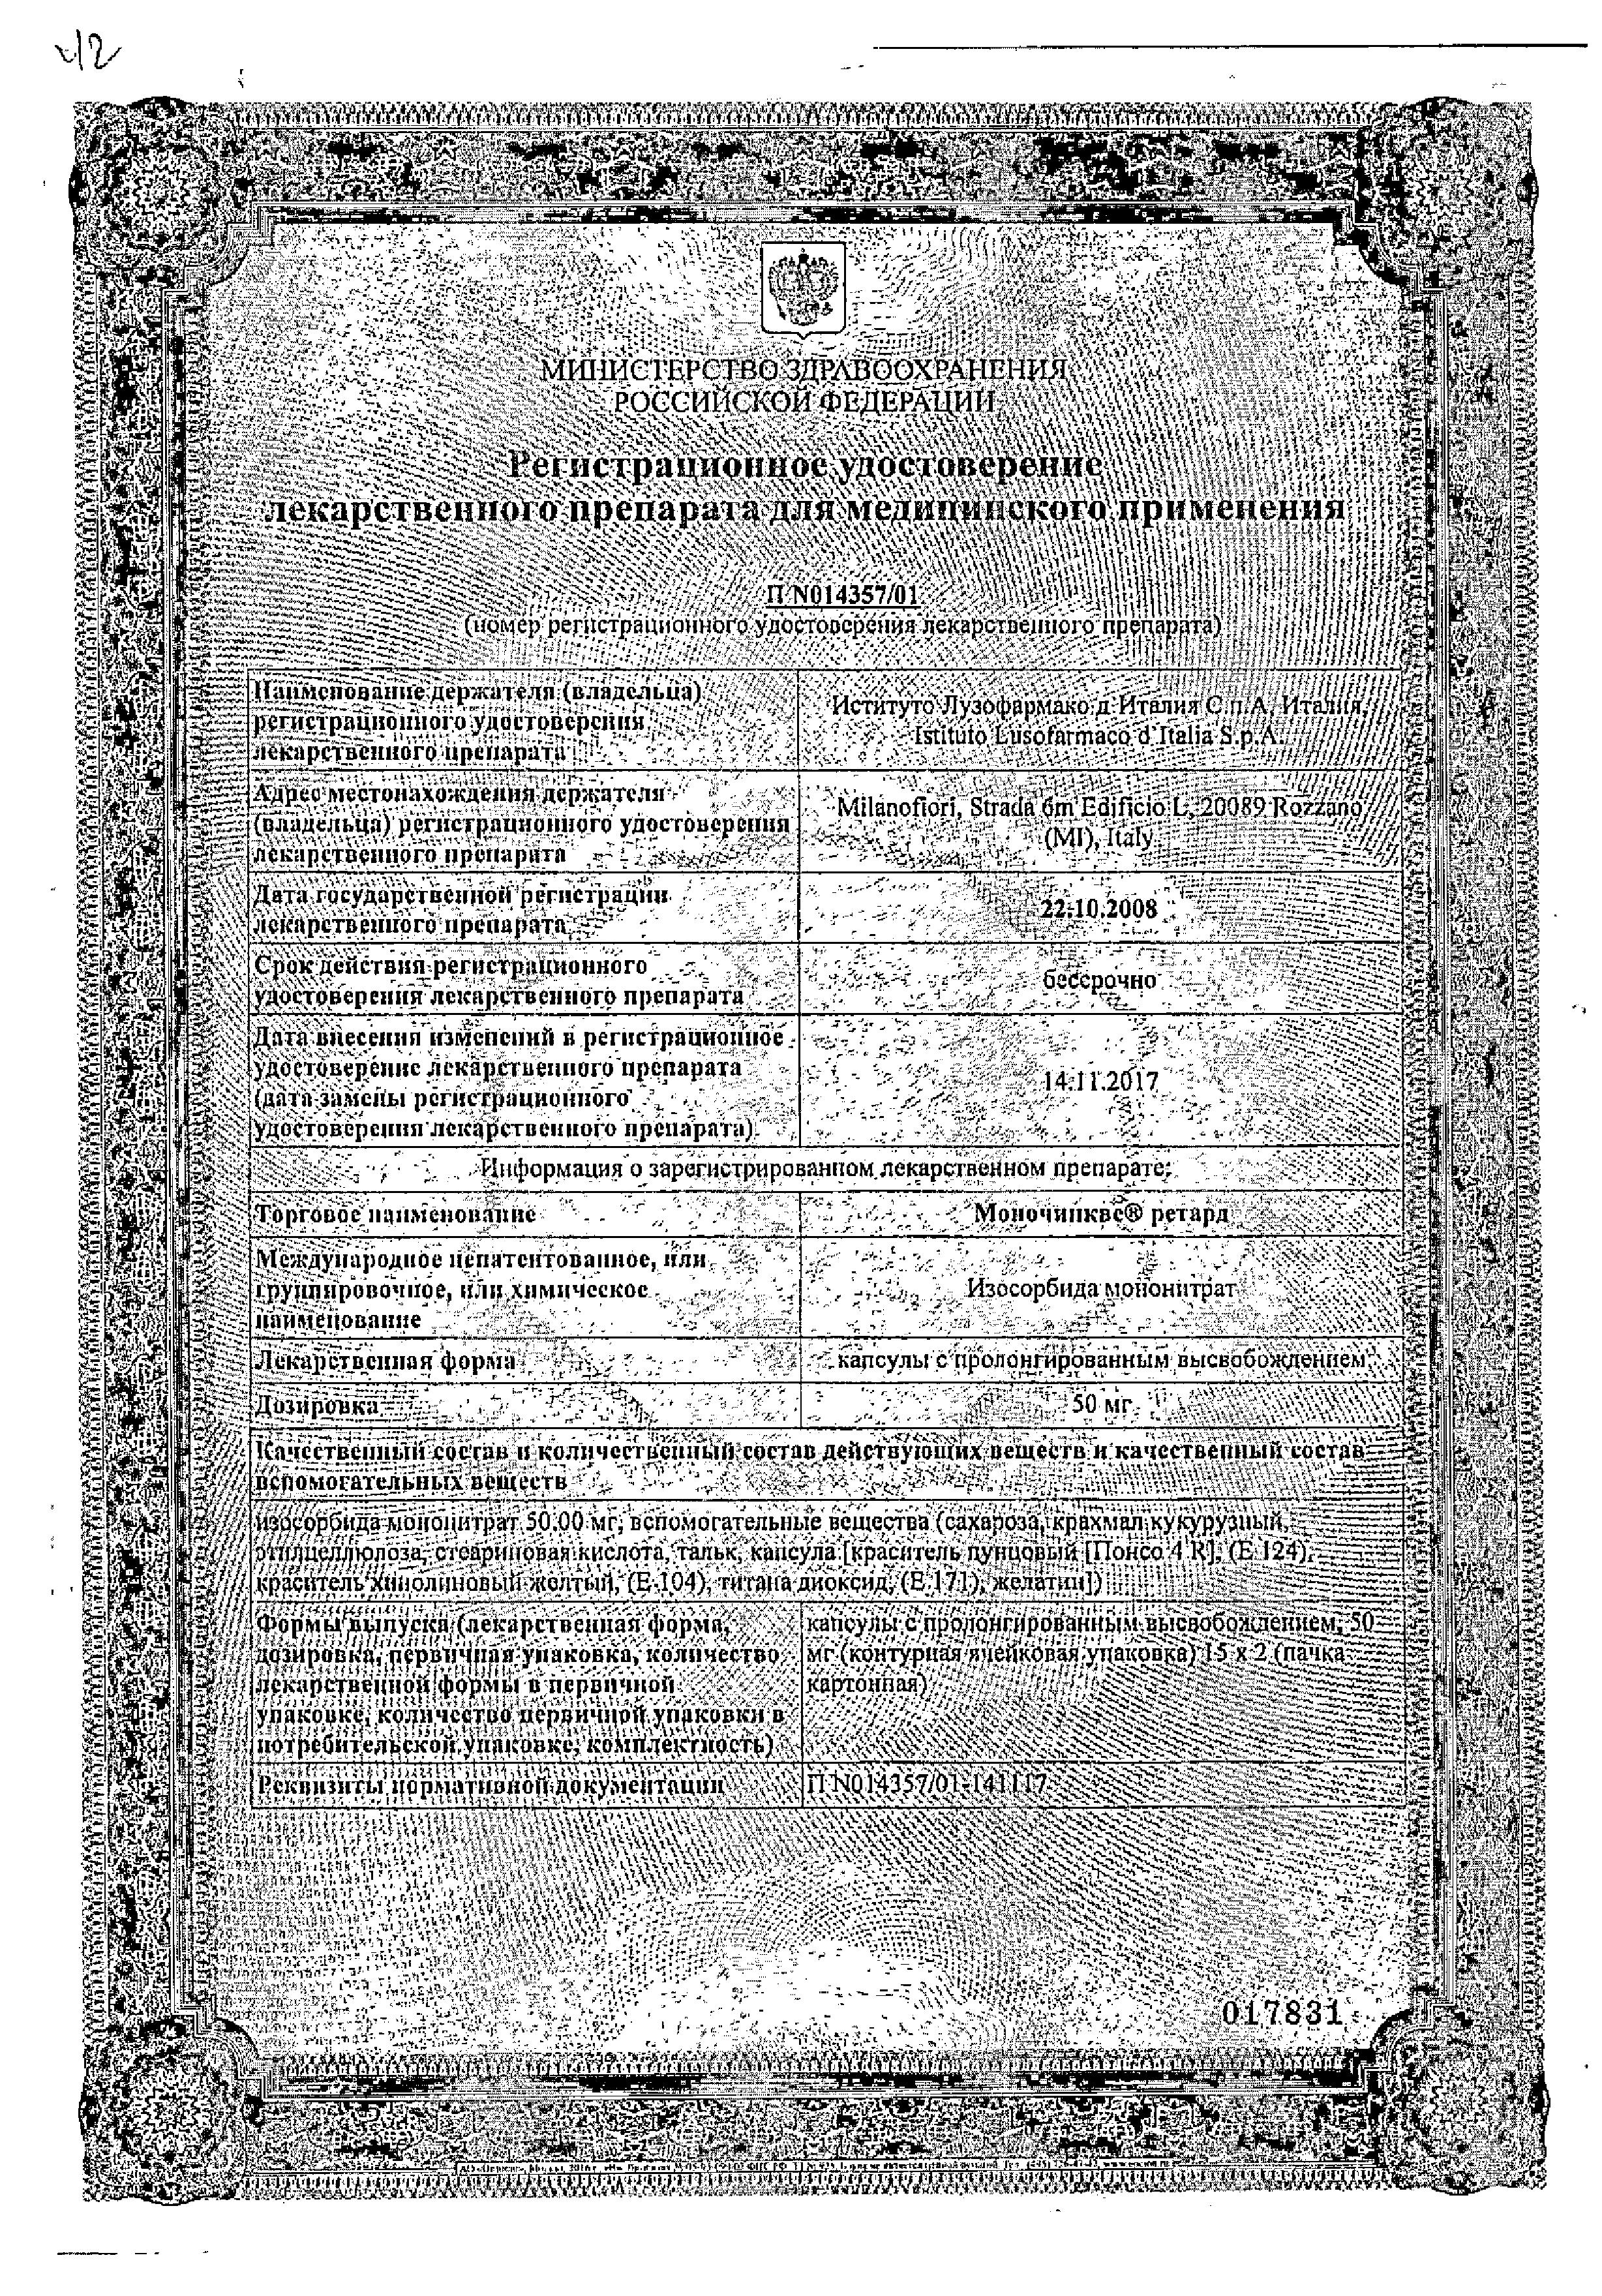 Моночинкве ретард сертификат